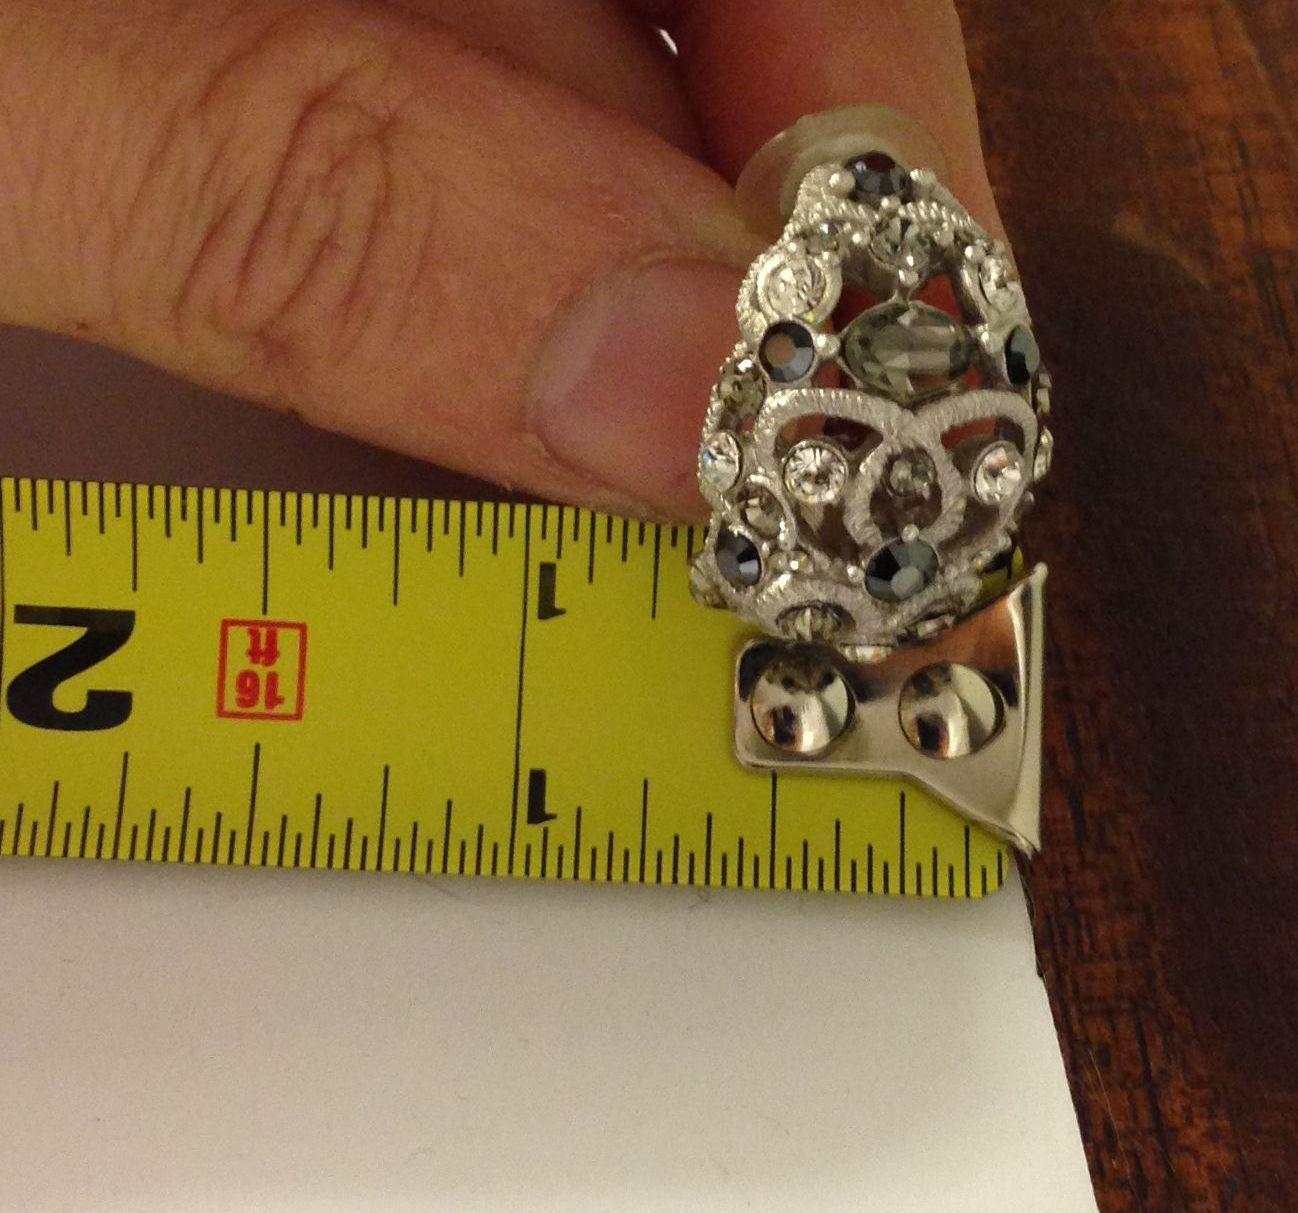 VTG Silvertone Filigree *Smoke/Black/Clear Rhinestones Cluster Pierced Earrings image 8